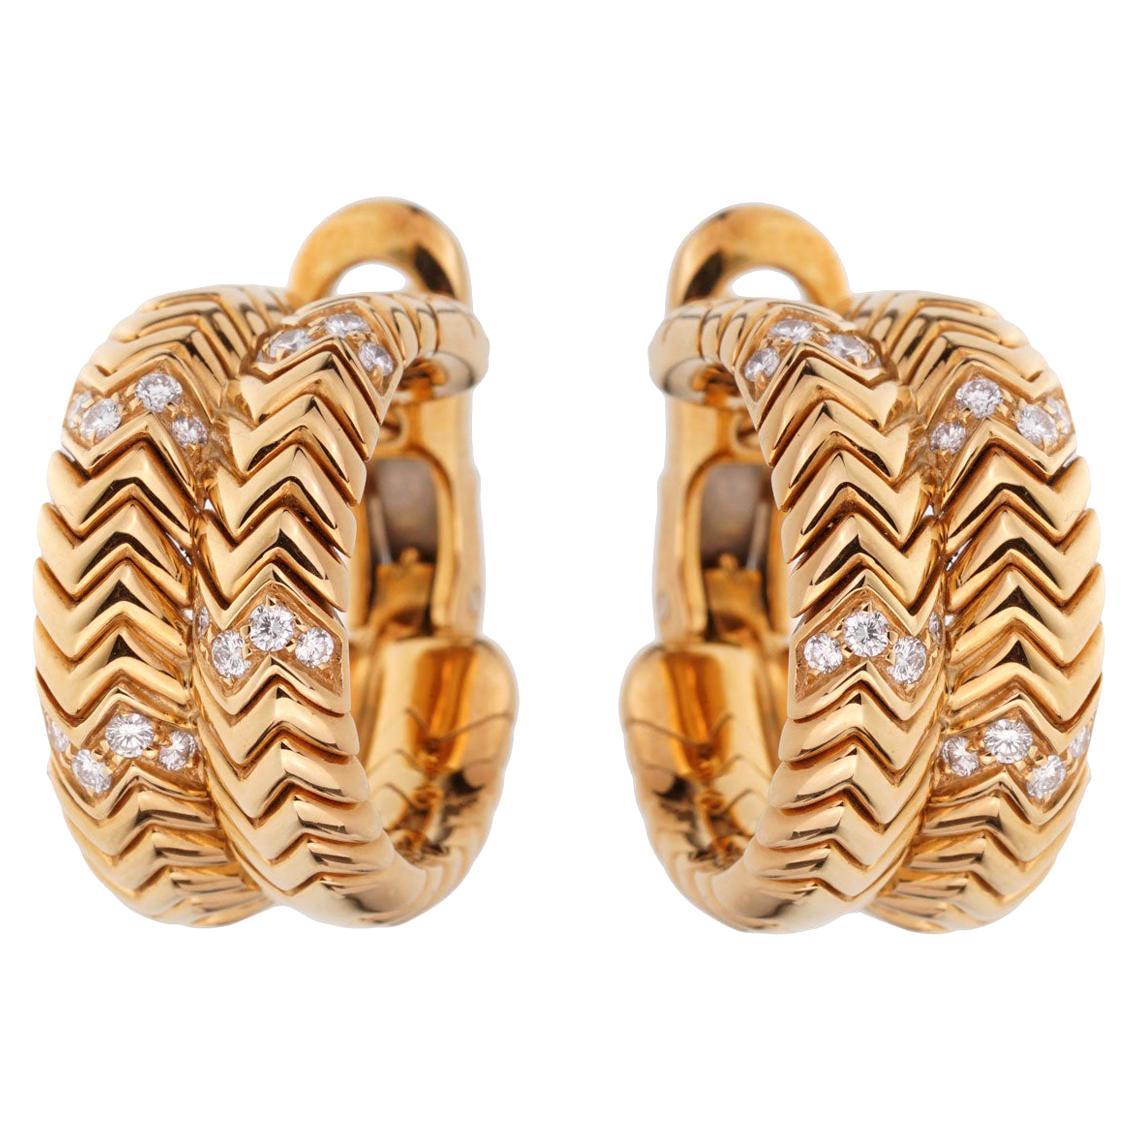 Bulgari Spiga Yellow Gold Diamond Earrings